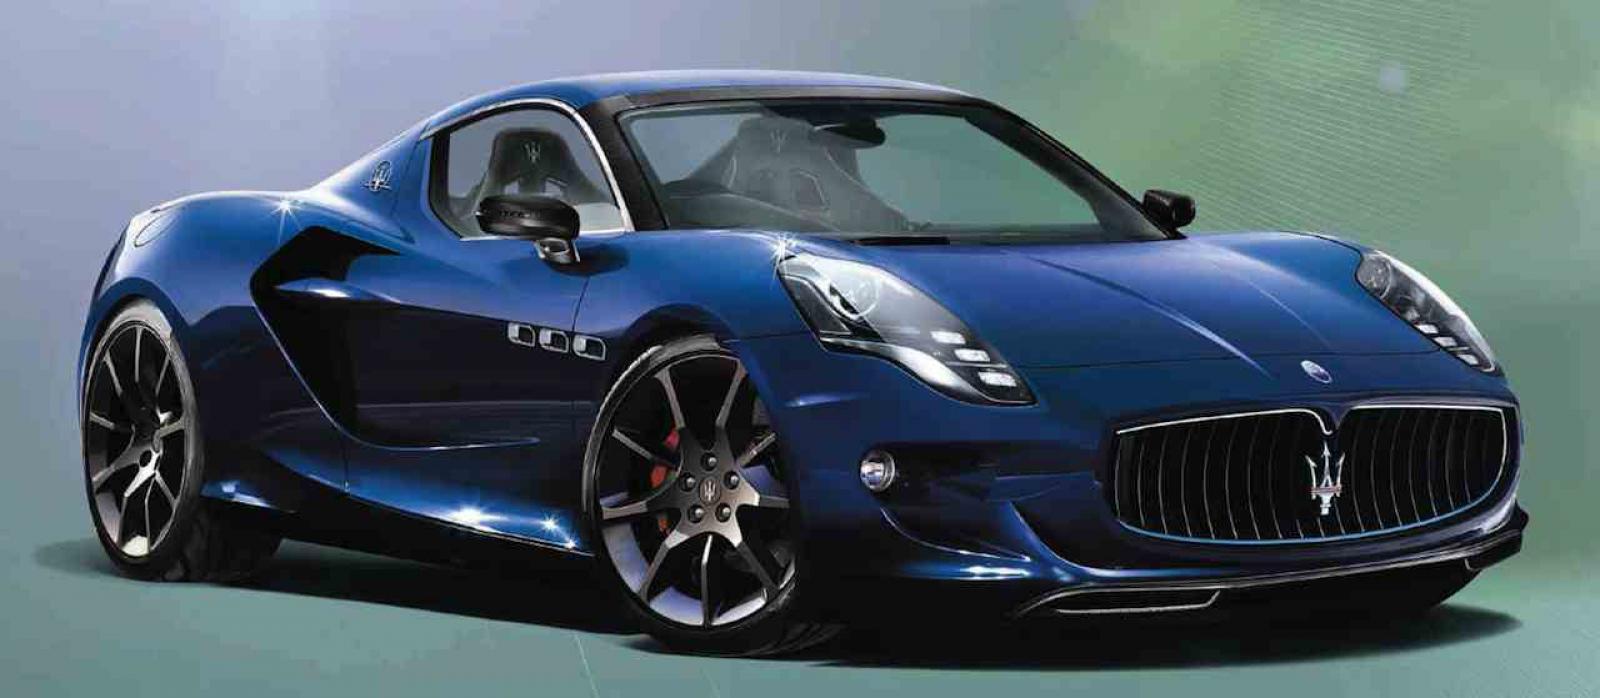 2015 Maserati Granturismo Information And Photos